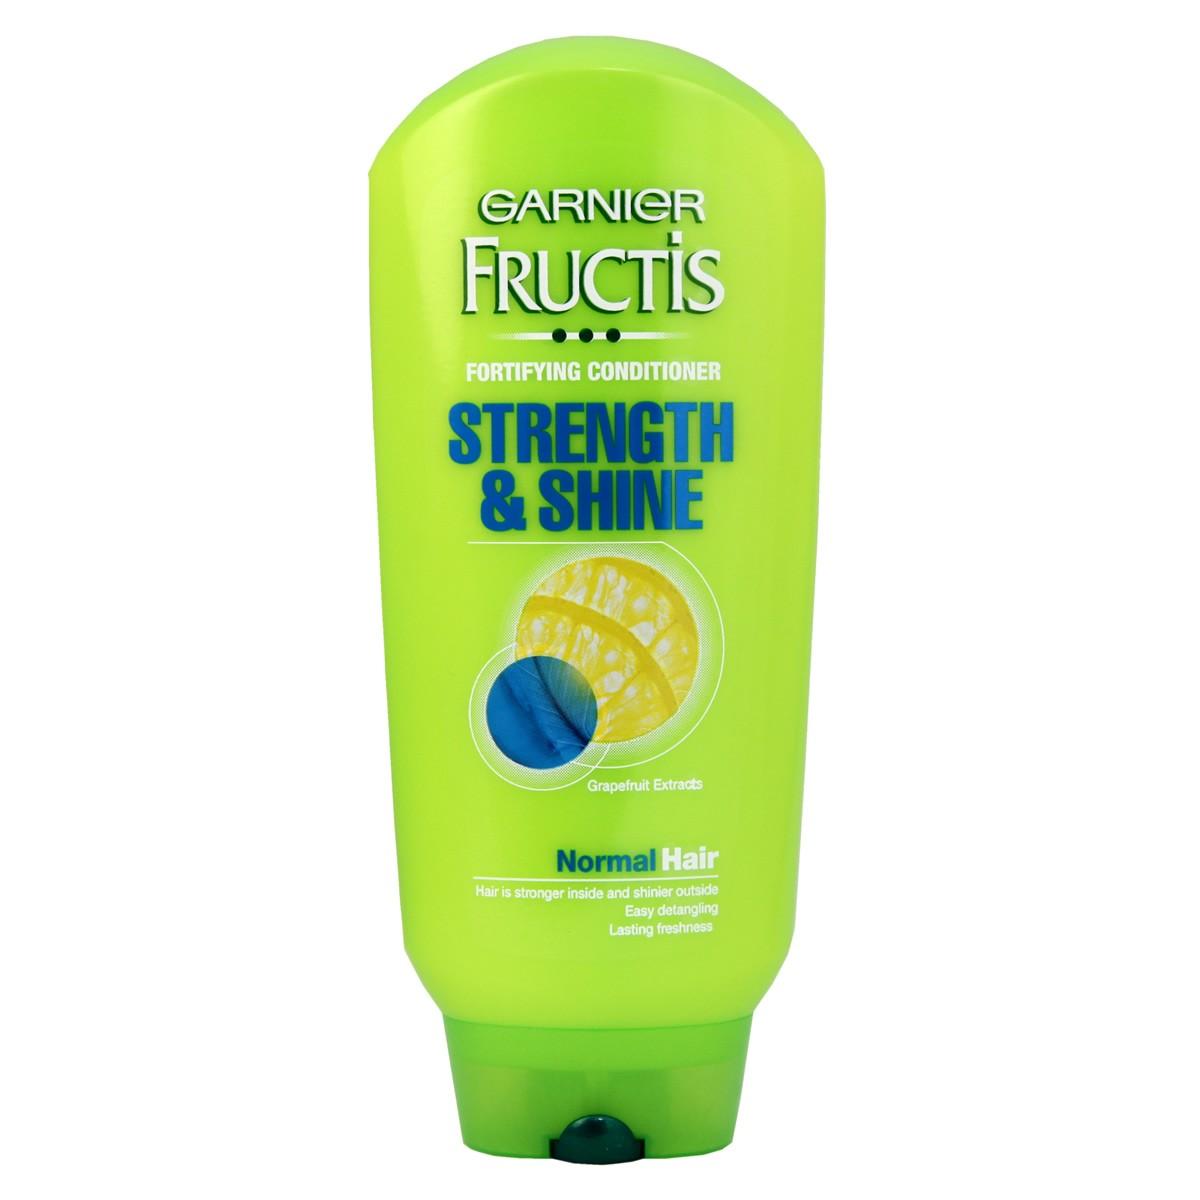 Garnier Fructis Strength & Shine Conditioner